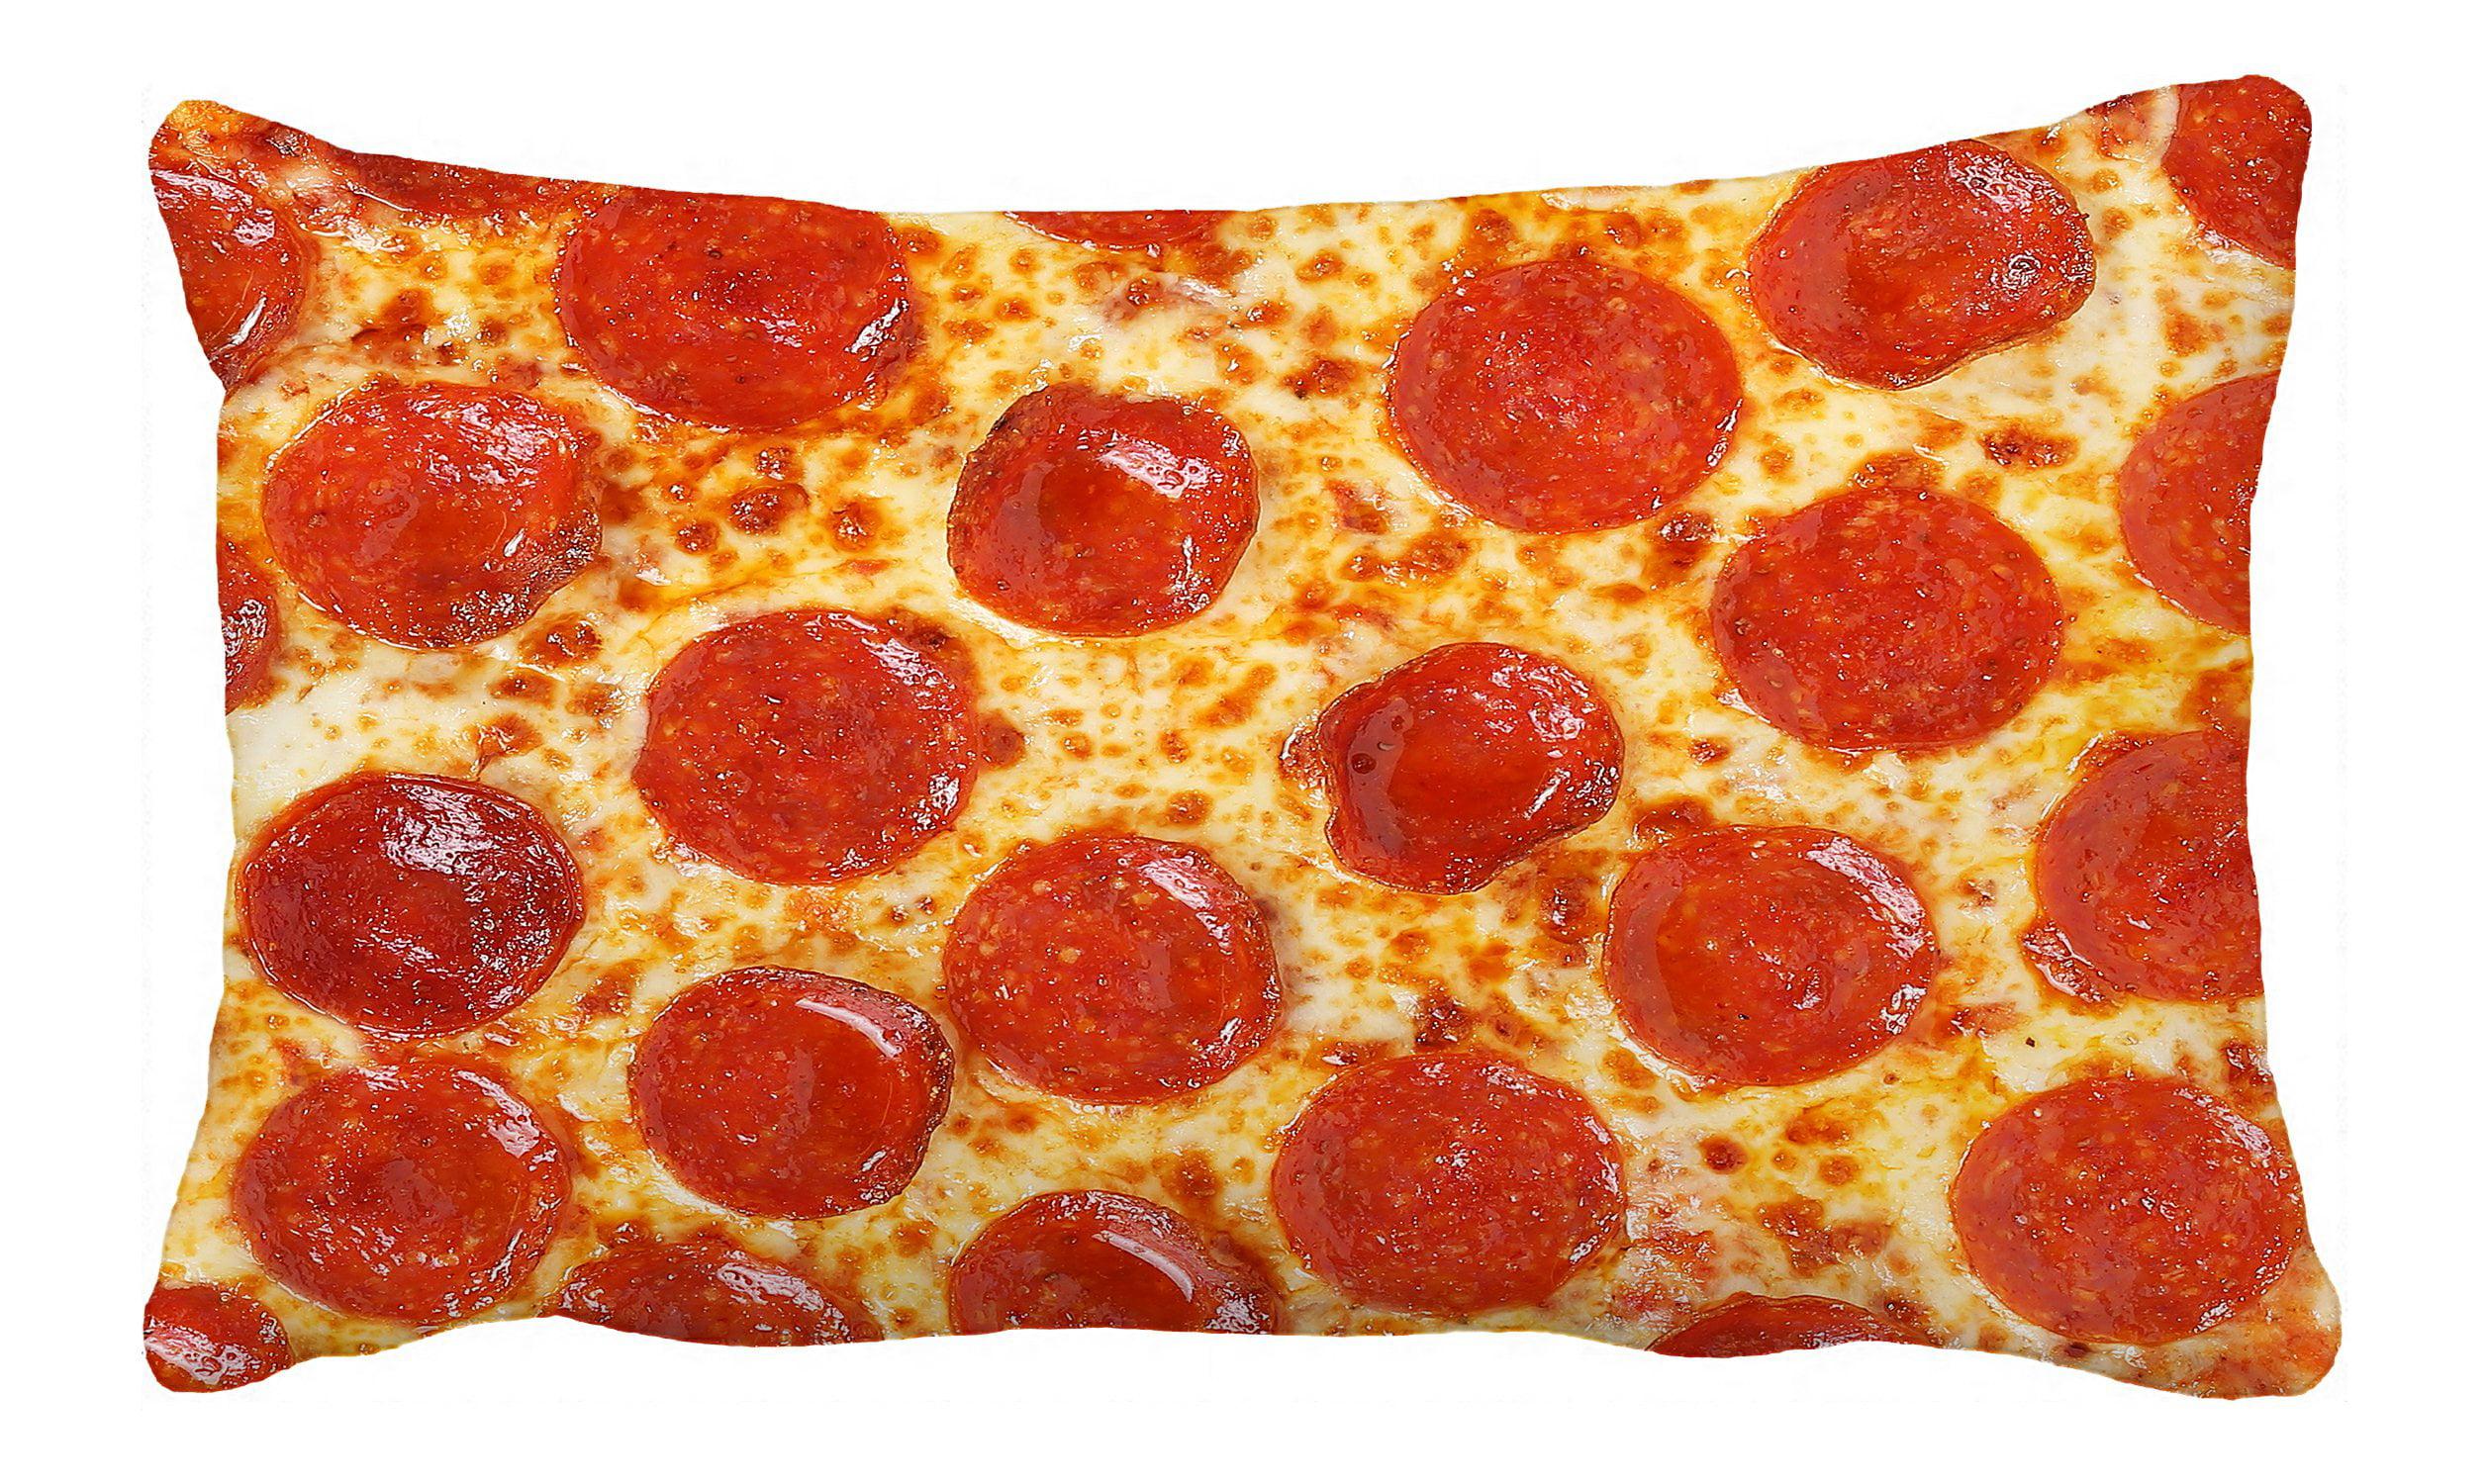 Phfzk Pizza Pillow Case Italian Classic Pepperoni Pizza Pillowcase Throw Pillow Cushion Cover Two Sides Size 20x30 Inches Walmart Com Walmart Com